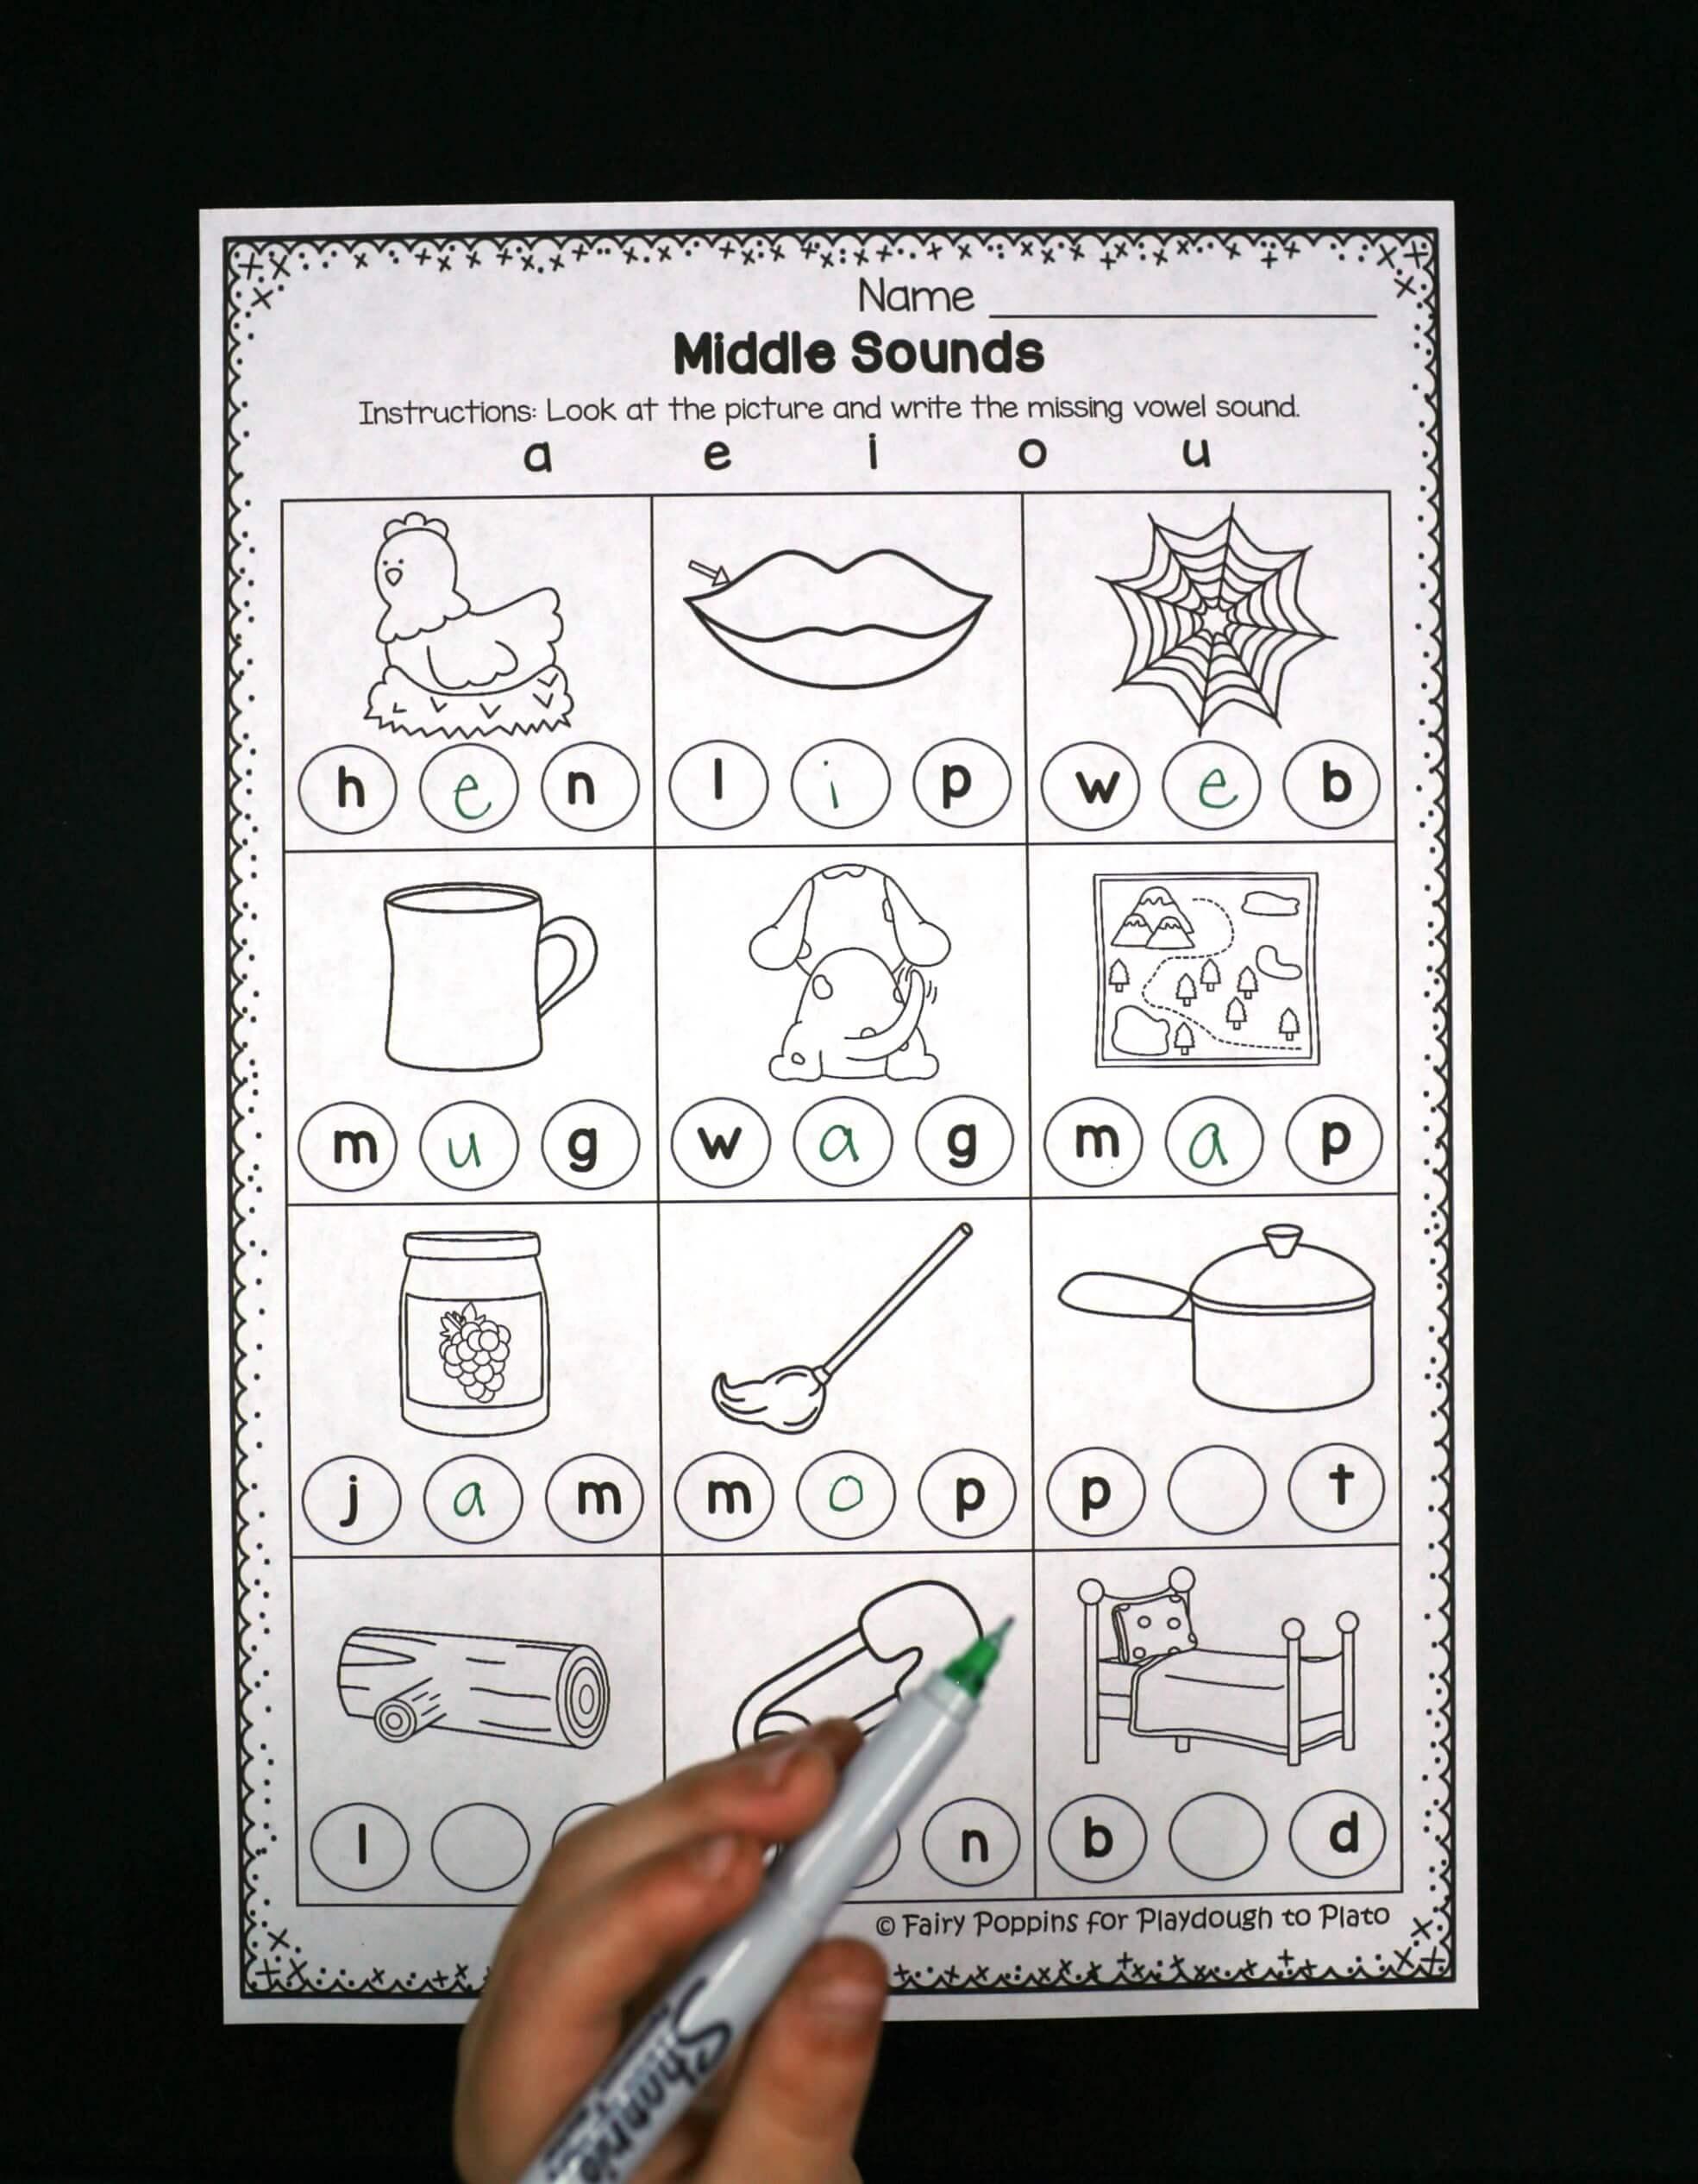 Middle Sounds Worksheets - Playdough To Plato | Free Printable Phoneme Segmentation Worksheets